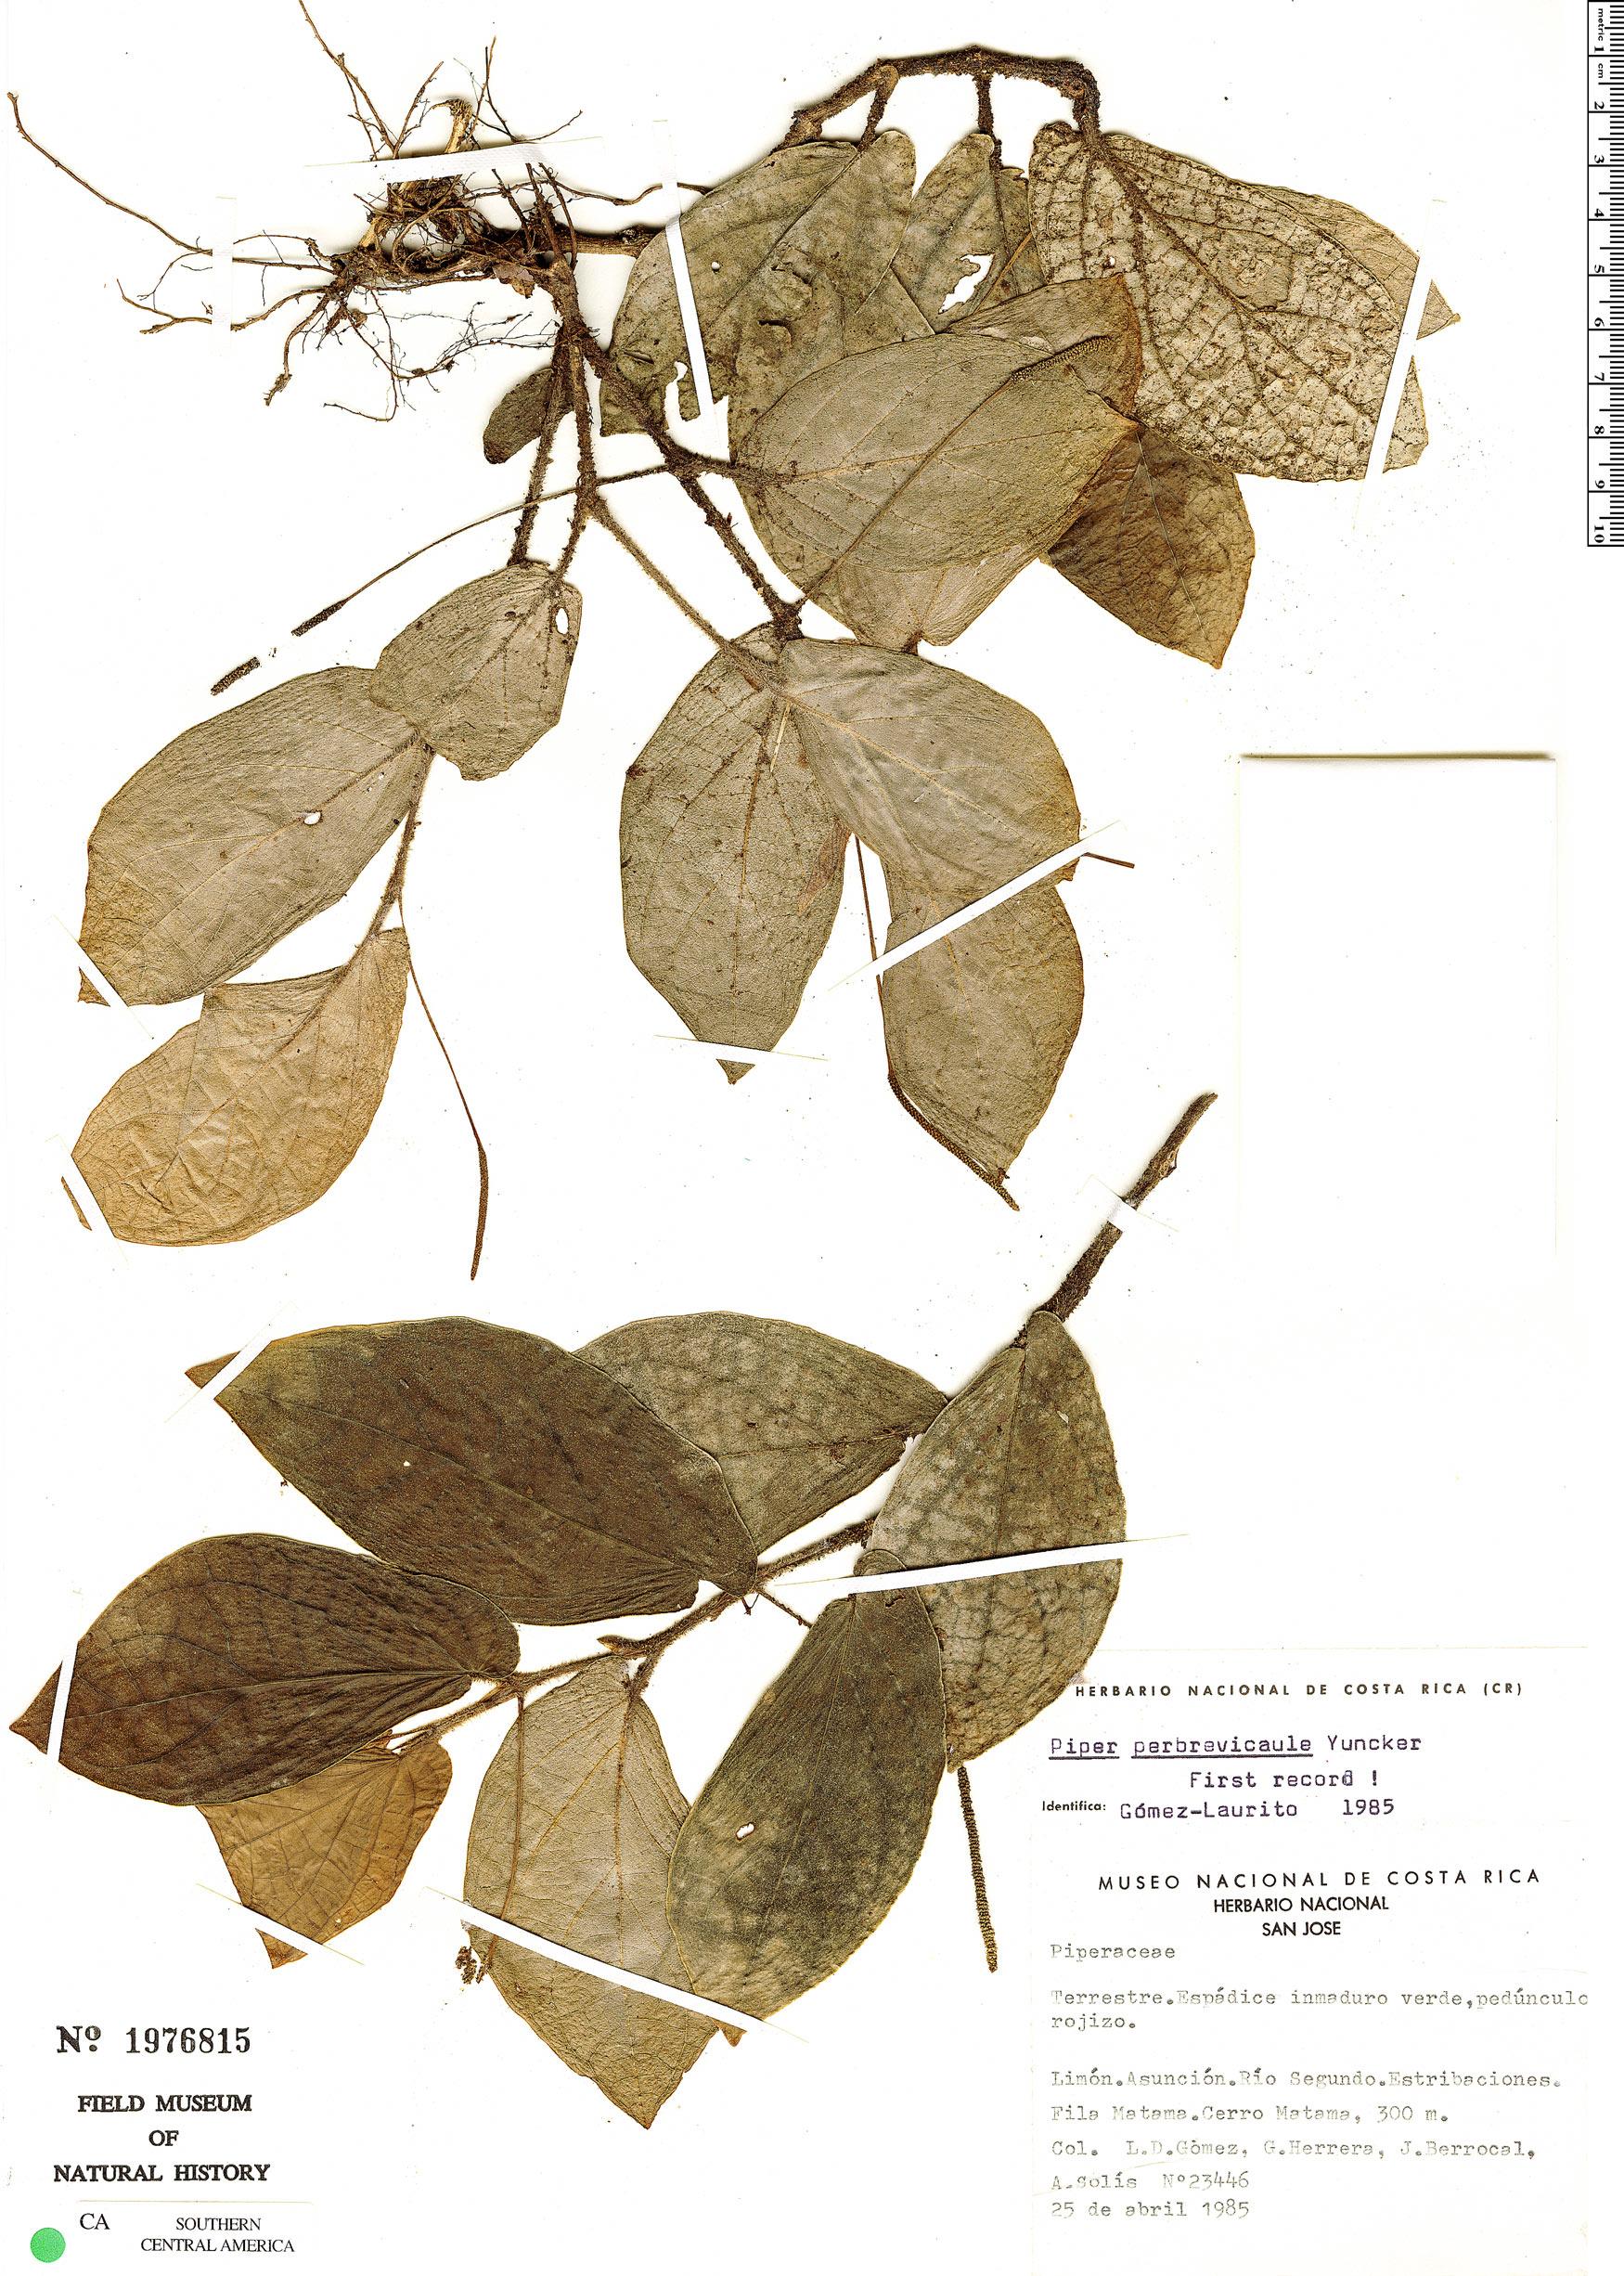 Espécime: Piper perbrevicaule